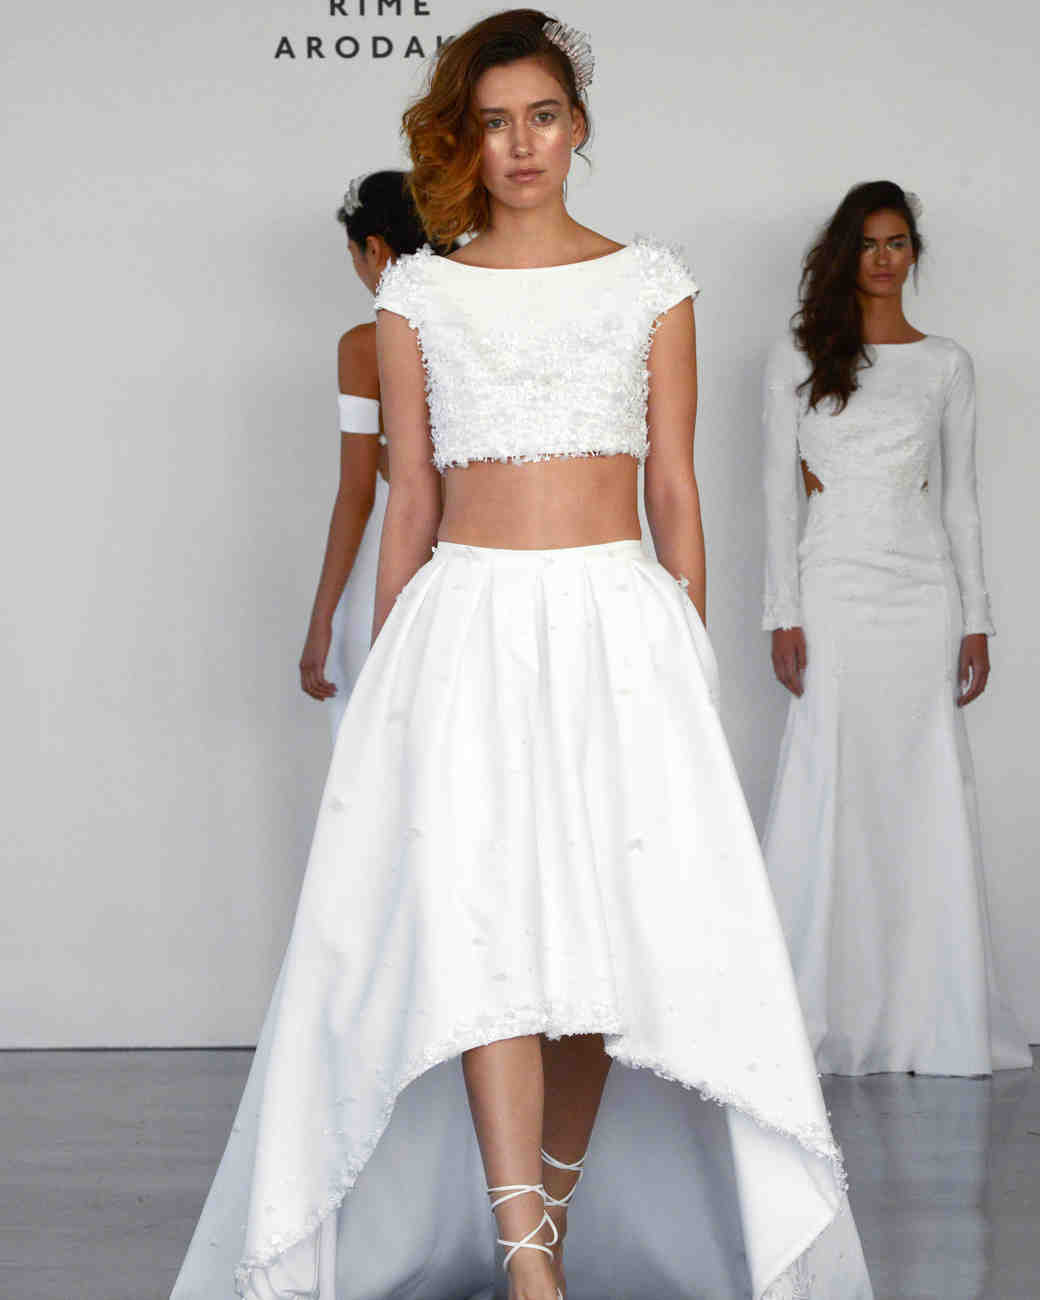 28 two piece wedding dresses martha stewart weddings. Black Bedroom Furniture Sets. Home Design Ideas